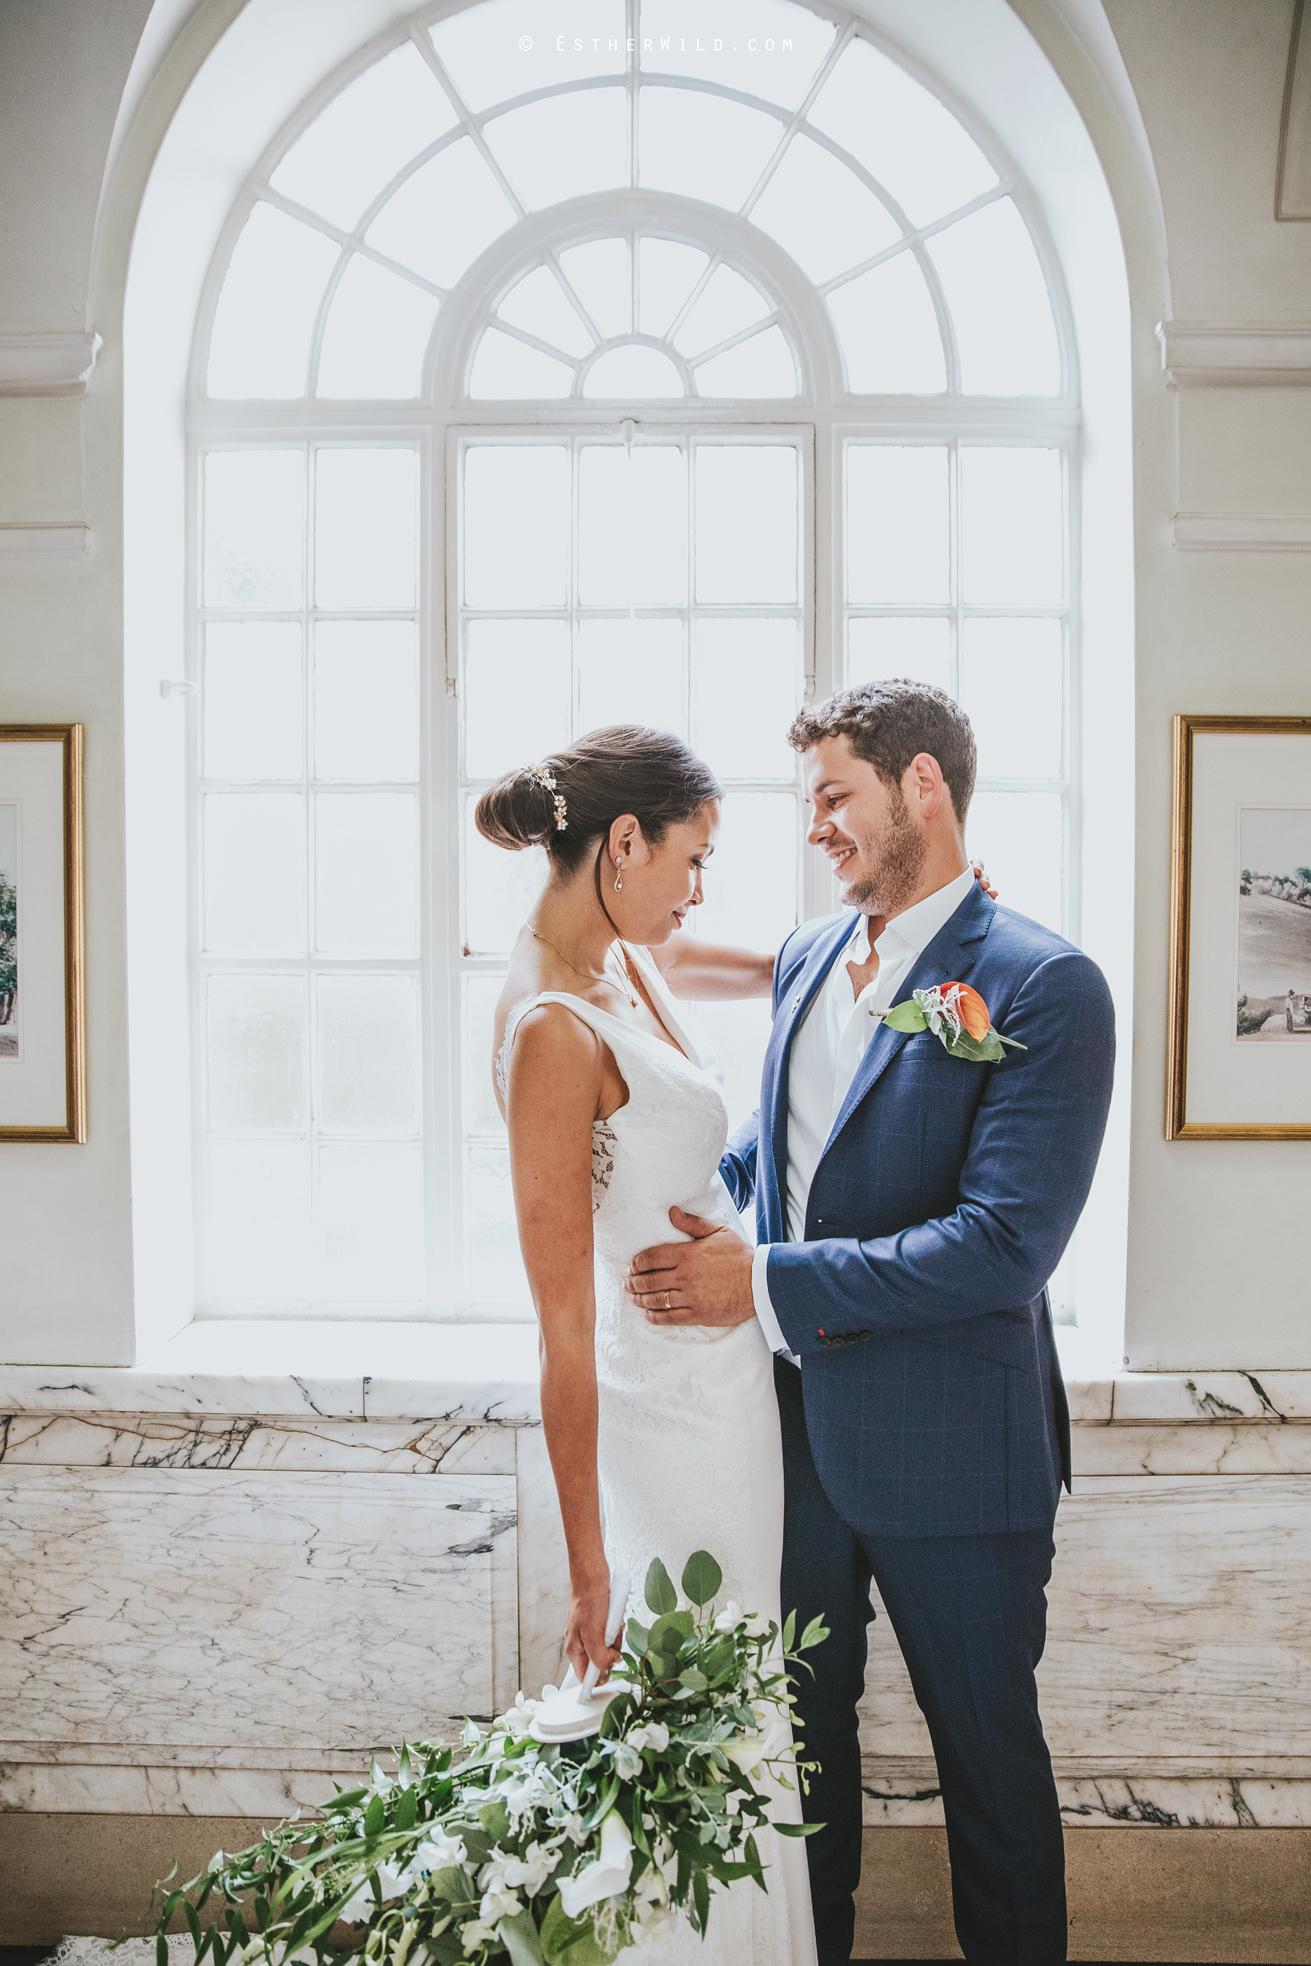 Islington_Town_Hall_Wedding_London_Photographer_Esther_Wild_IMG_5185.jpg